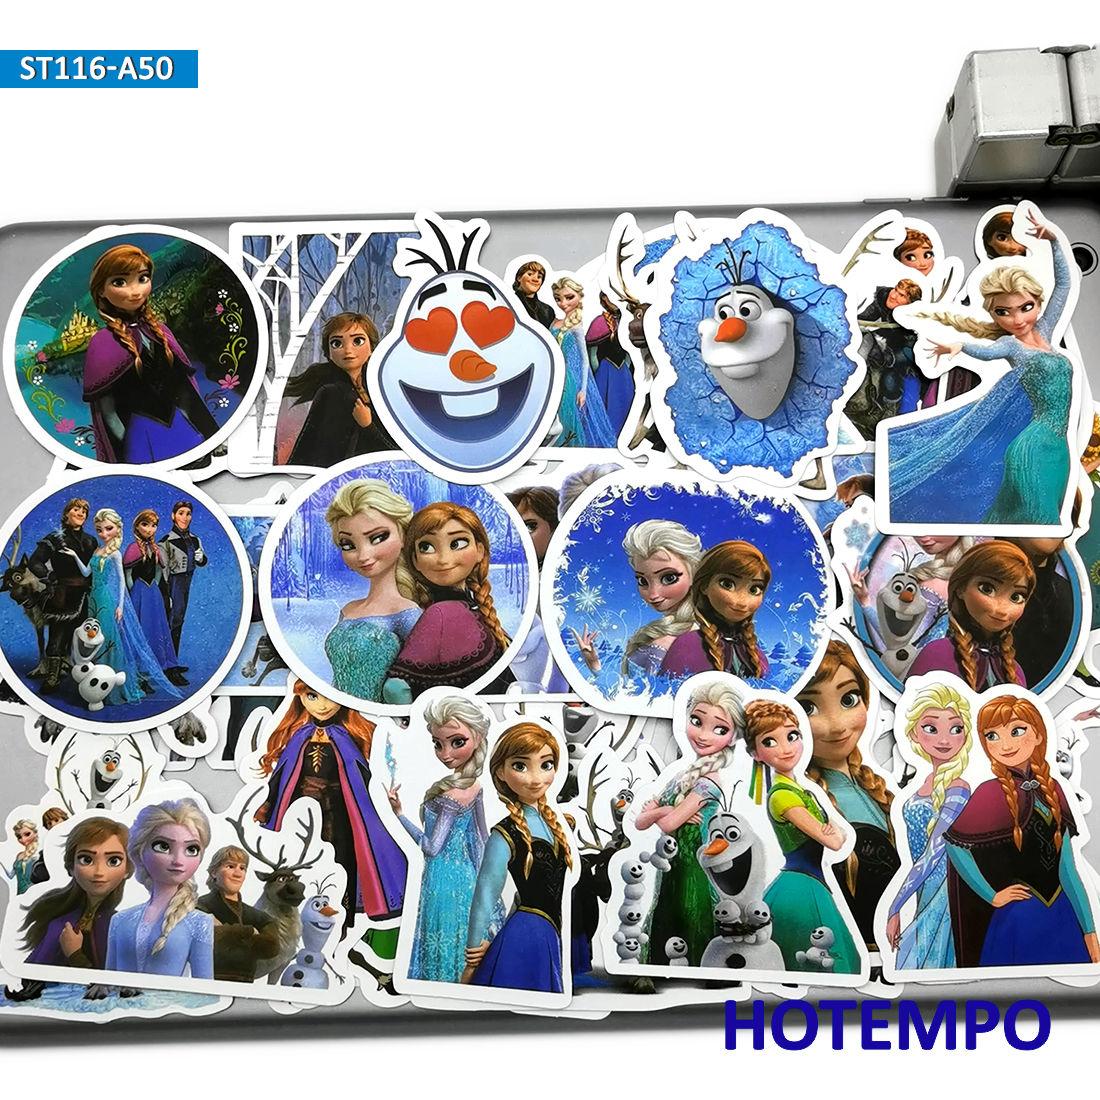 50 Uds. Pegatinas bonitas de Elsa Anna princesa Anime película juguetes para niños chica álbum de recortes Papelería Teléfono Móvil maleta para portátil pegatinas